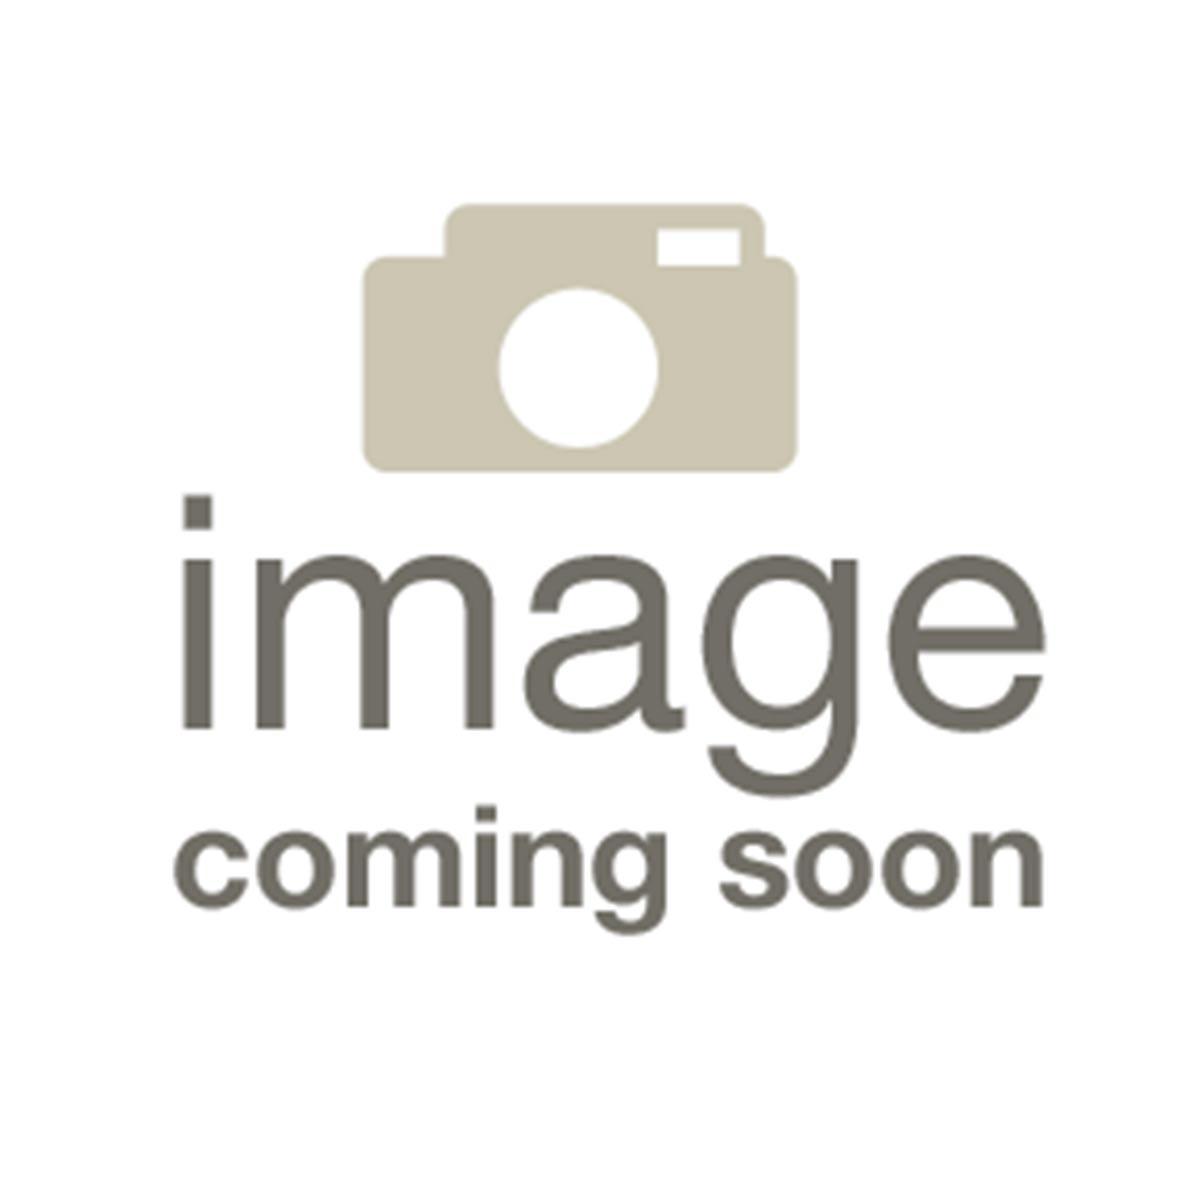 Touch Screen Smart Gloves - Fleece Lined  599 - Tartan Plaid Orange -